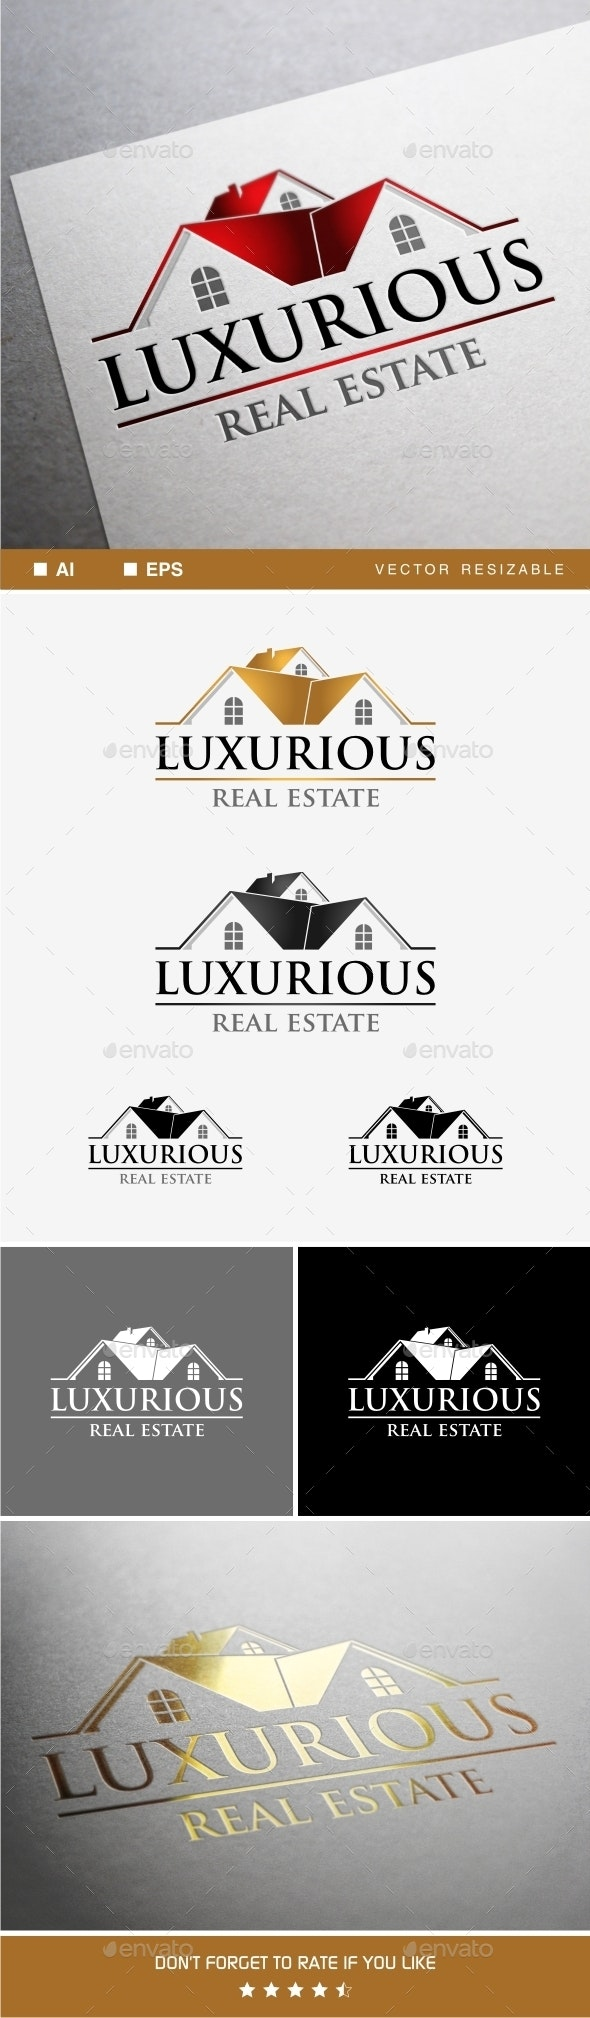 Luxurious Estate Logo - Buildings Logo Templates